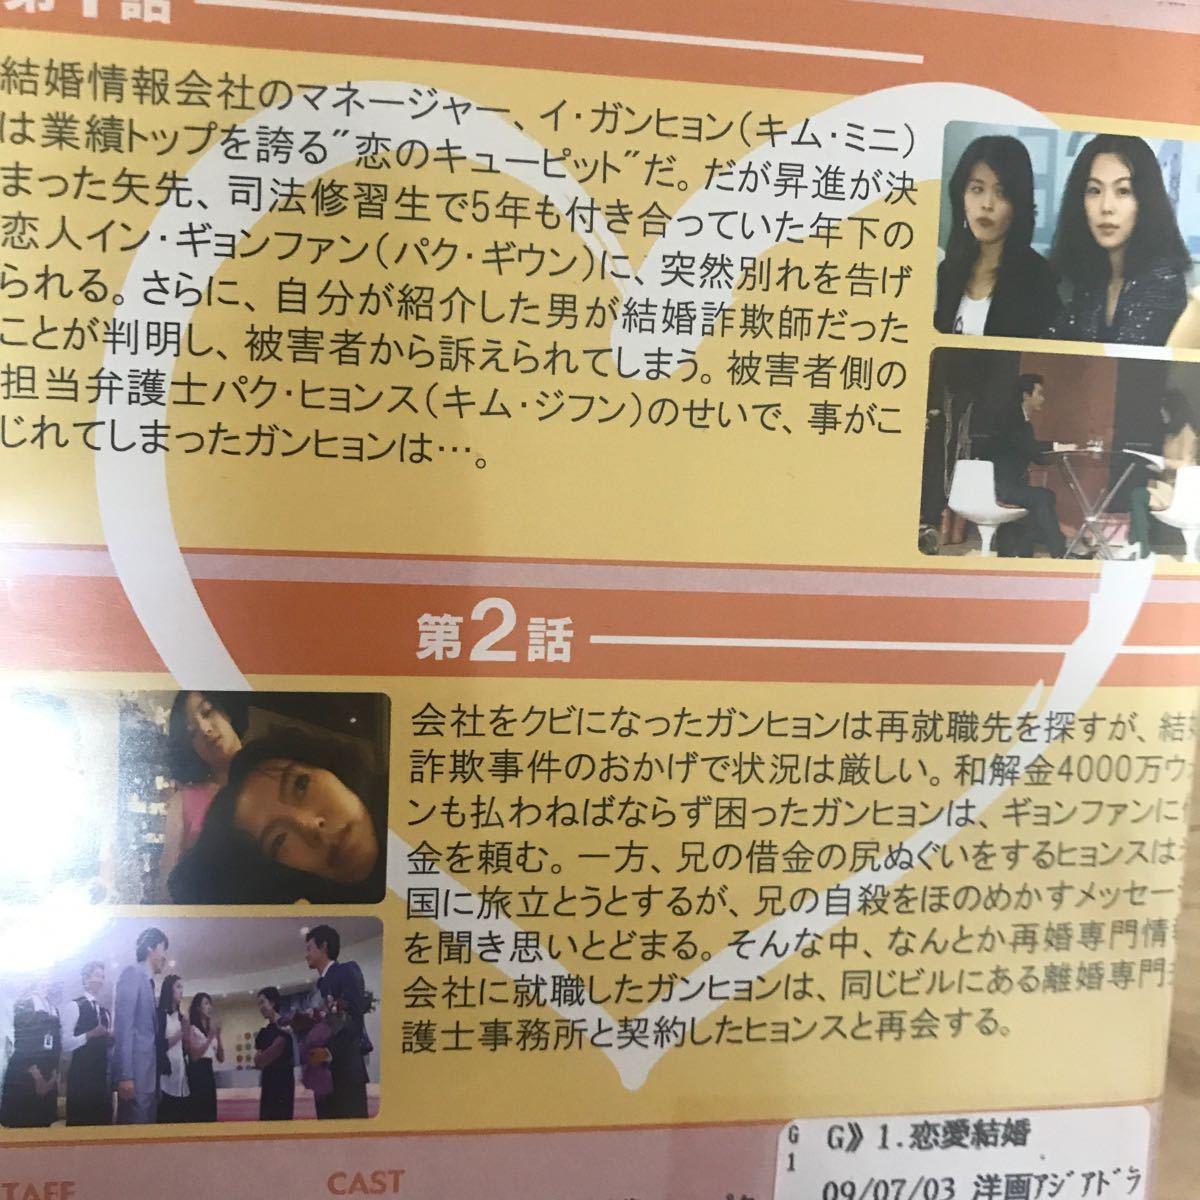 韓国ドラマ 恋愛結婚 DVD 8枚 匿名配送